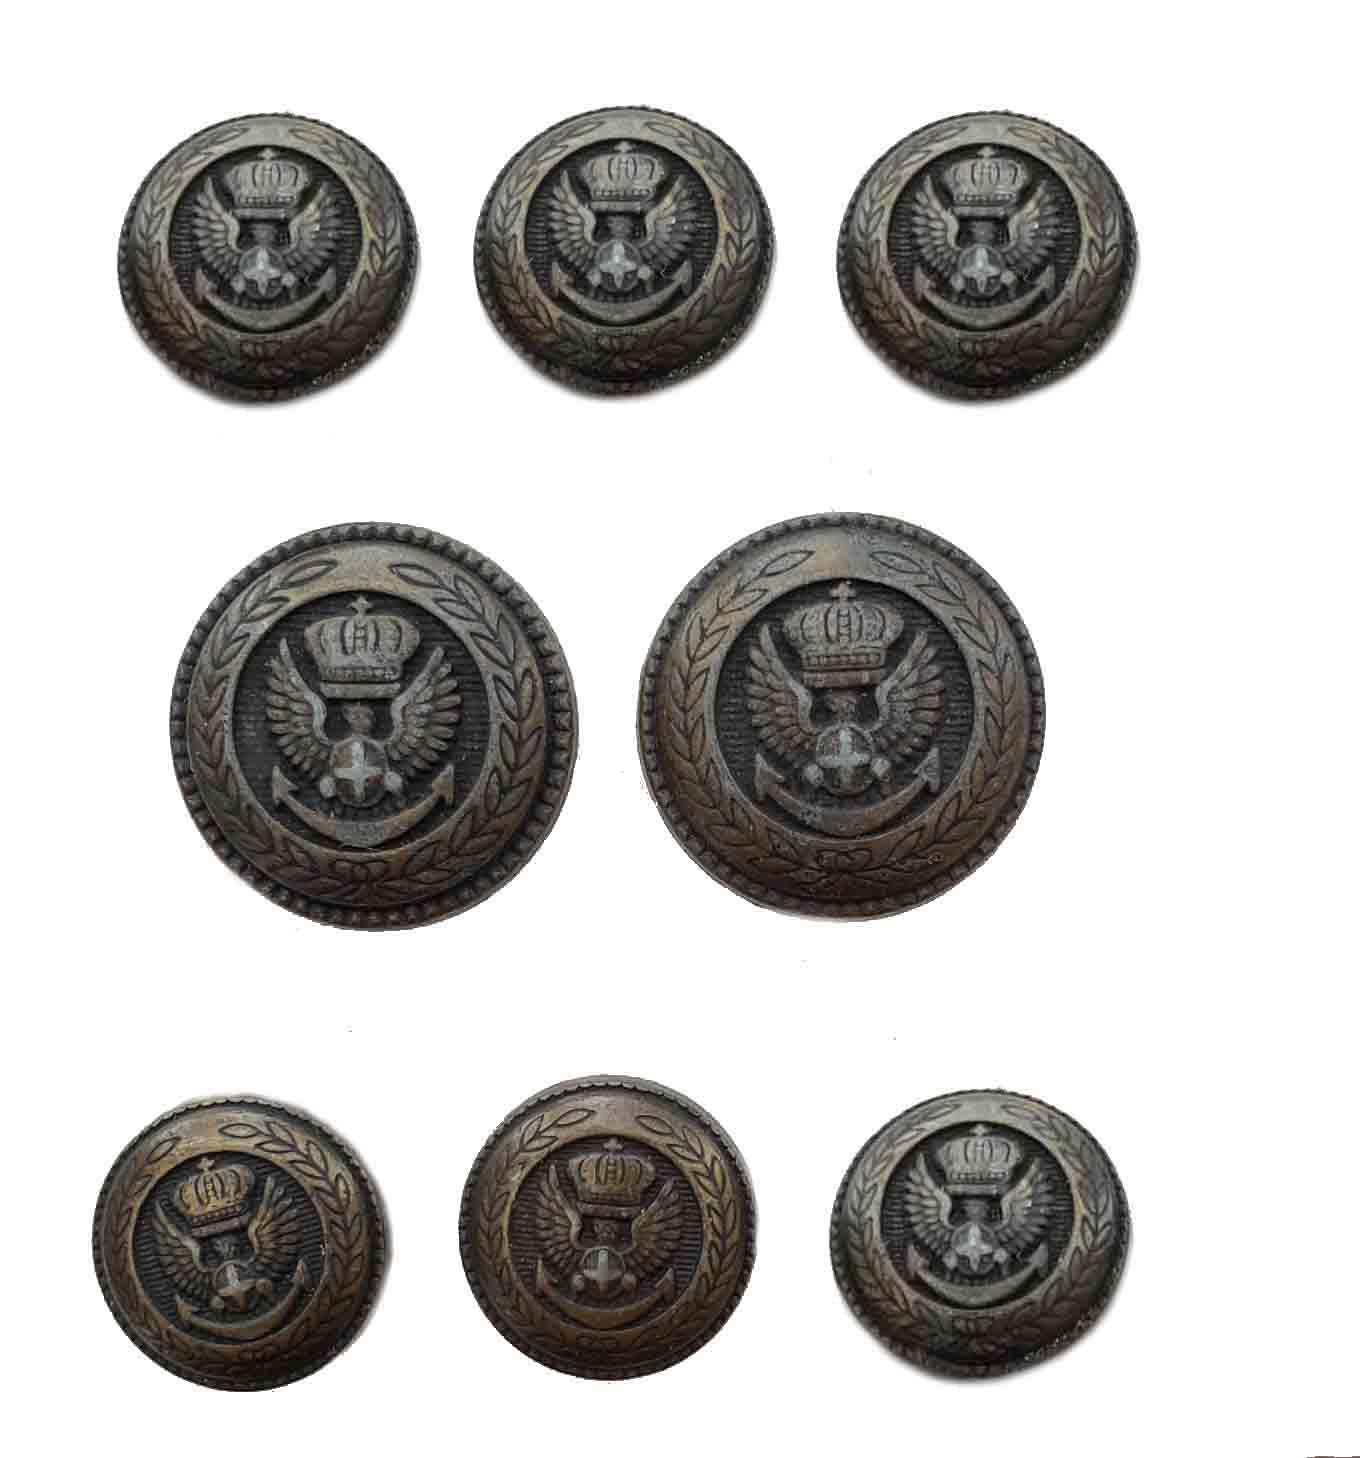 Vintage Jos A Bank Blazer Buttons Set Bronze Gray Gold Eagle Crown Anchor Metal Men's